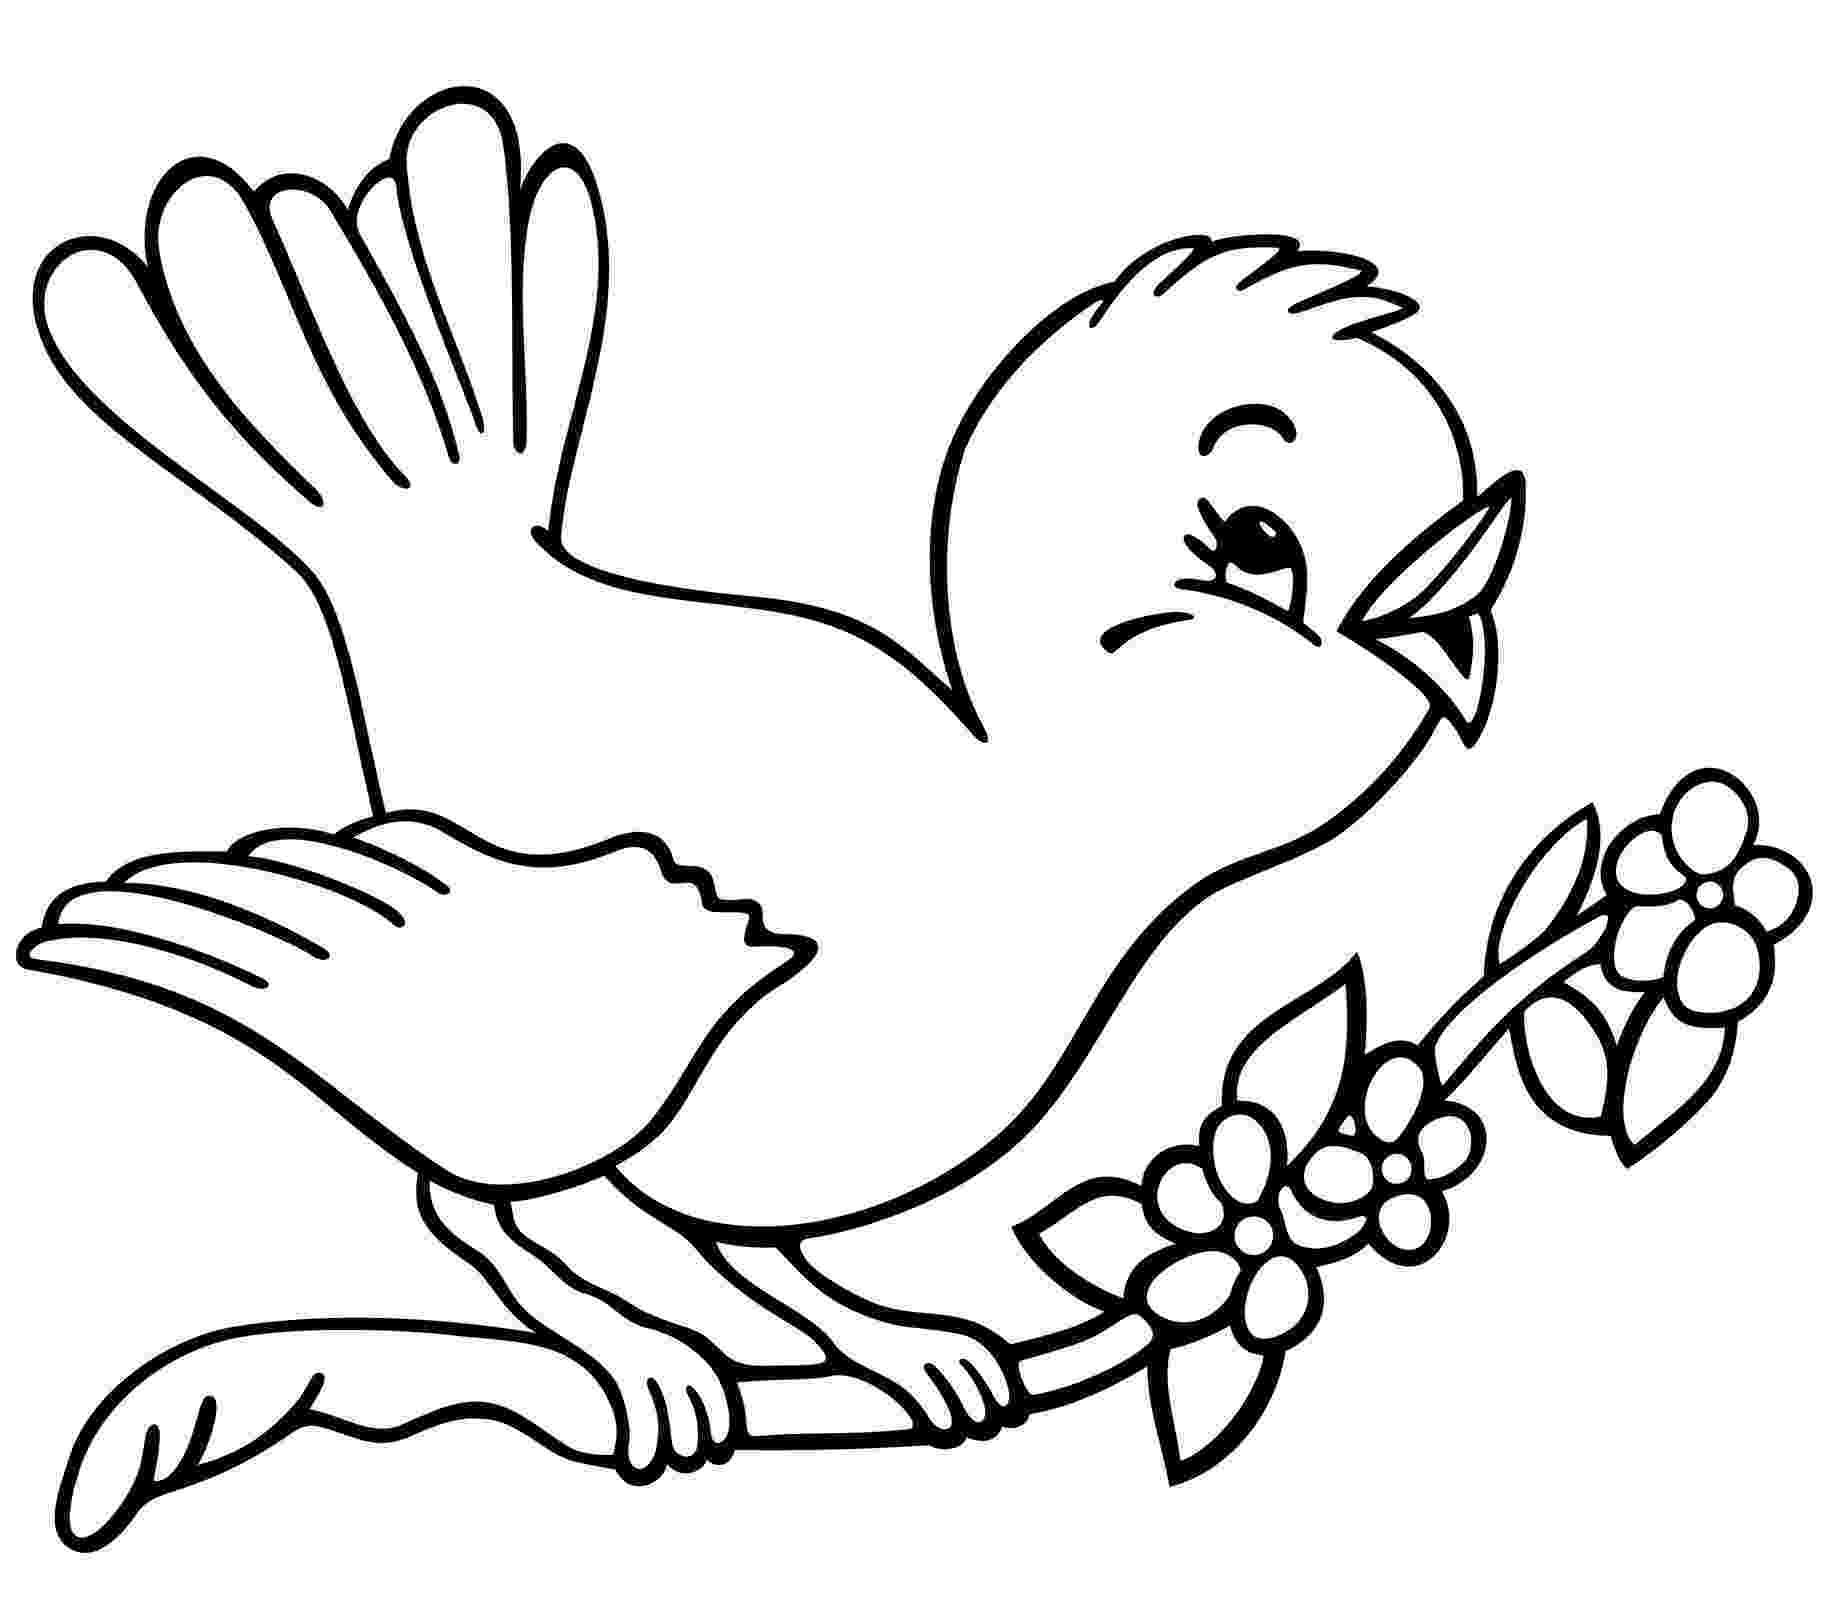 free printable bird coloring pages 20 free printable hummingbird coloring pages coloring pages printable free bird